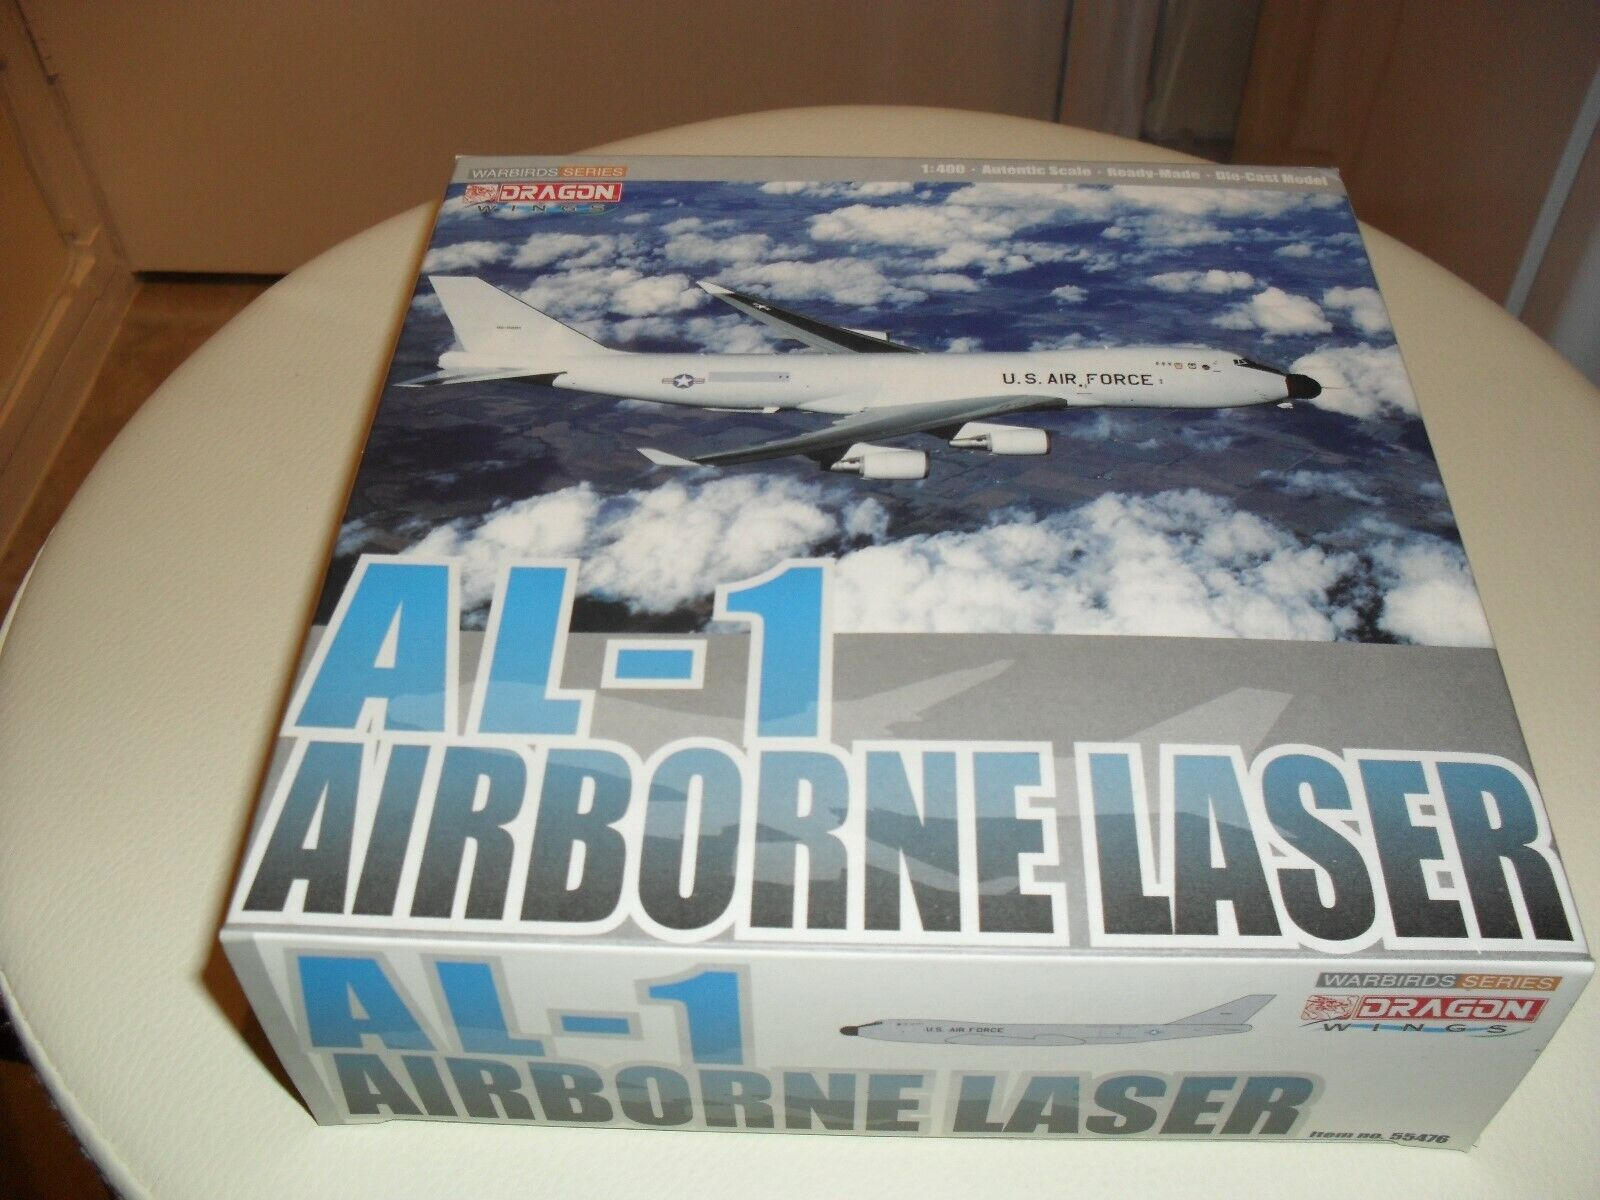 Dragon Wings WARBIRDS Series-AL-1 - Airborne Laser-US Air Force - 1 400